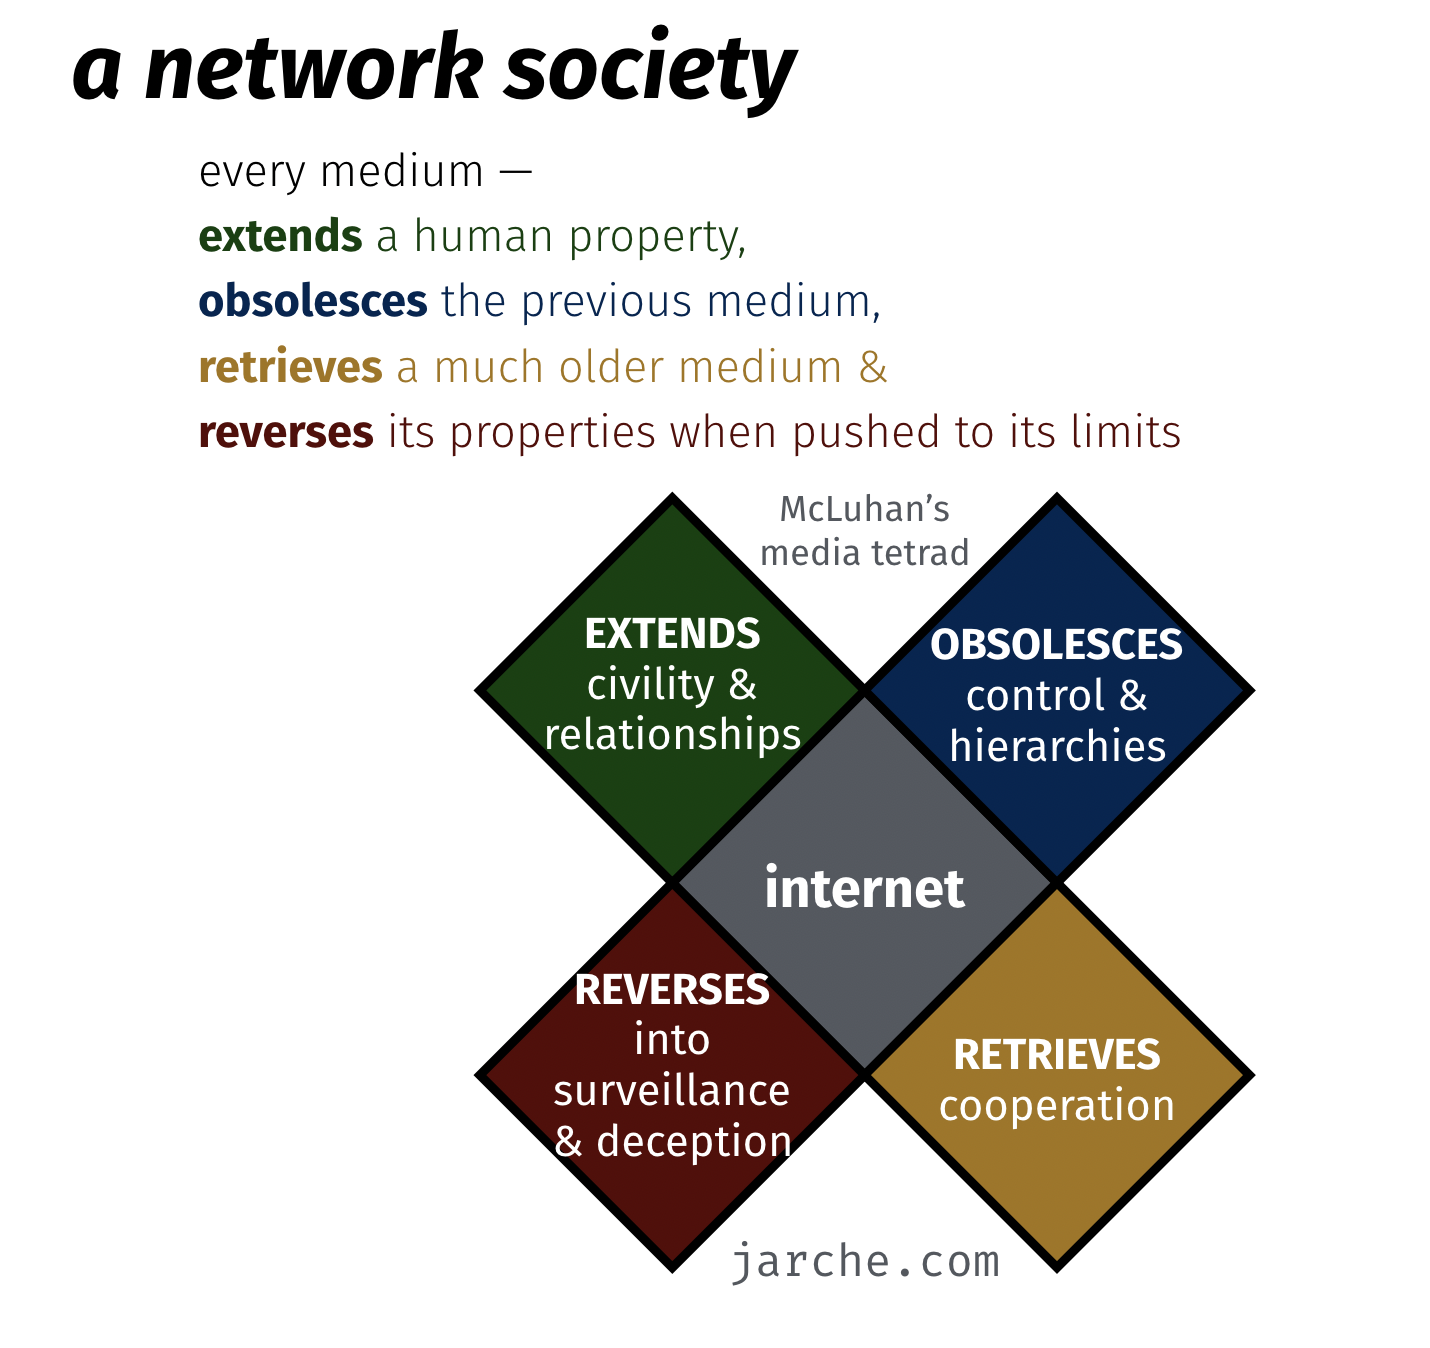 marshall mcluhan terad on a network society